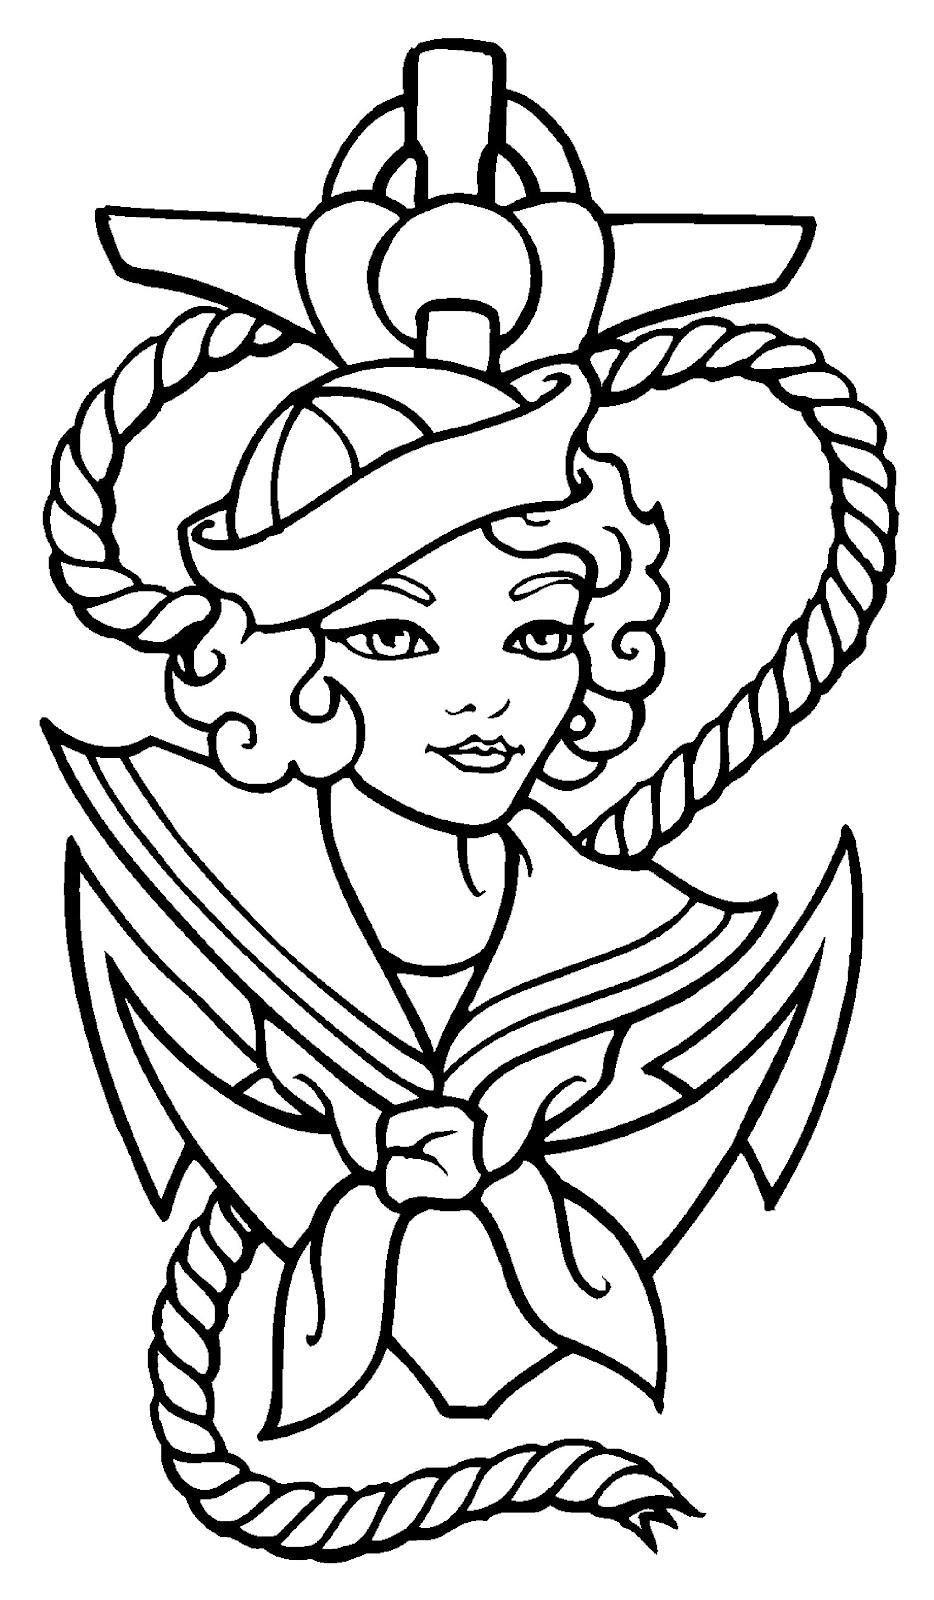 Free Tattoo Line Drawing : Tattoo drawings free clipart best